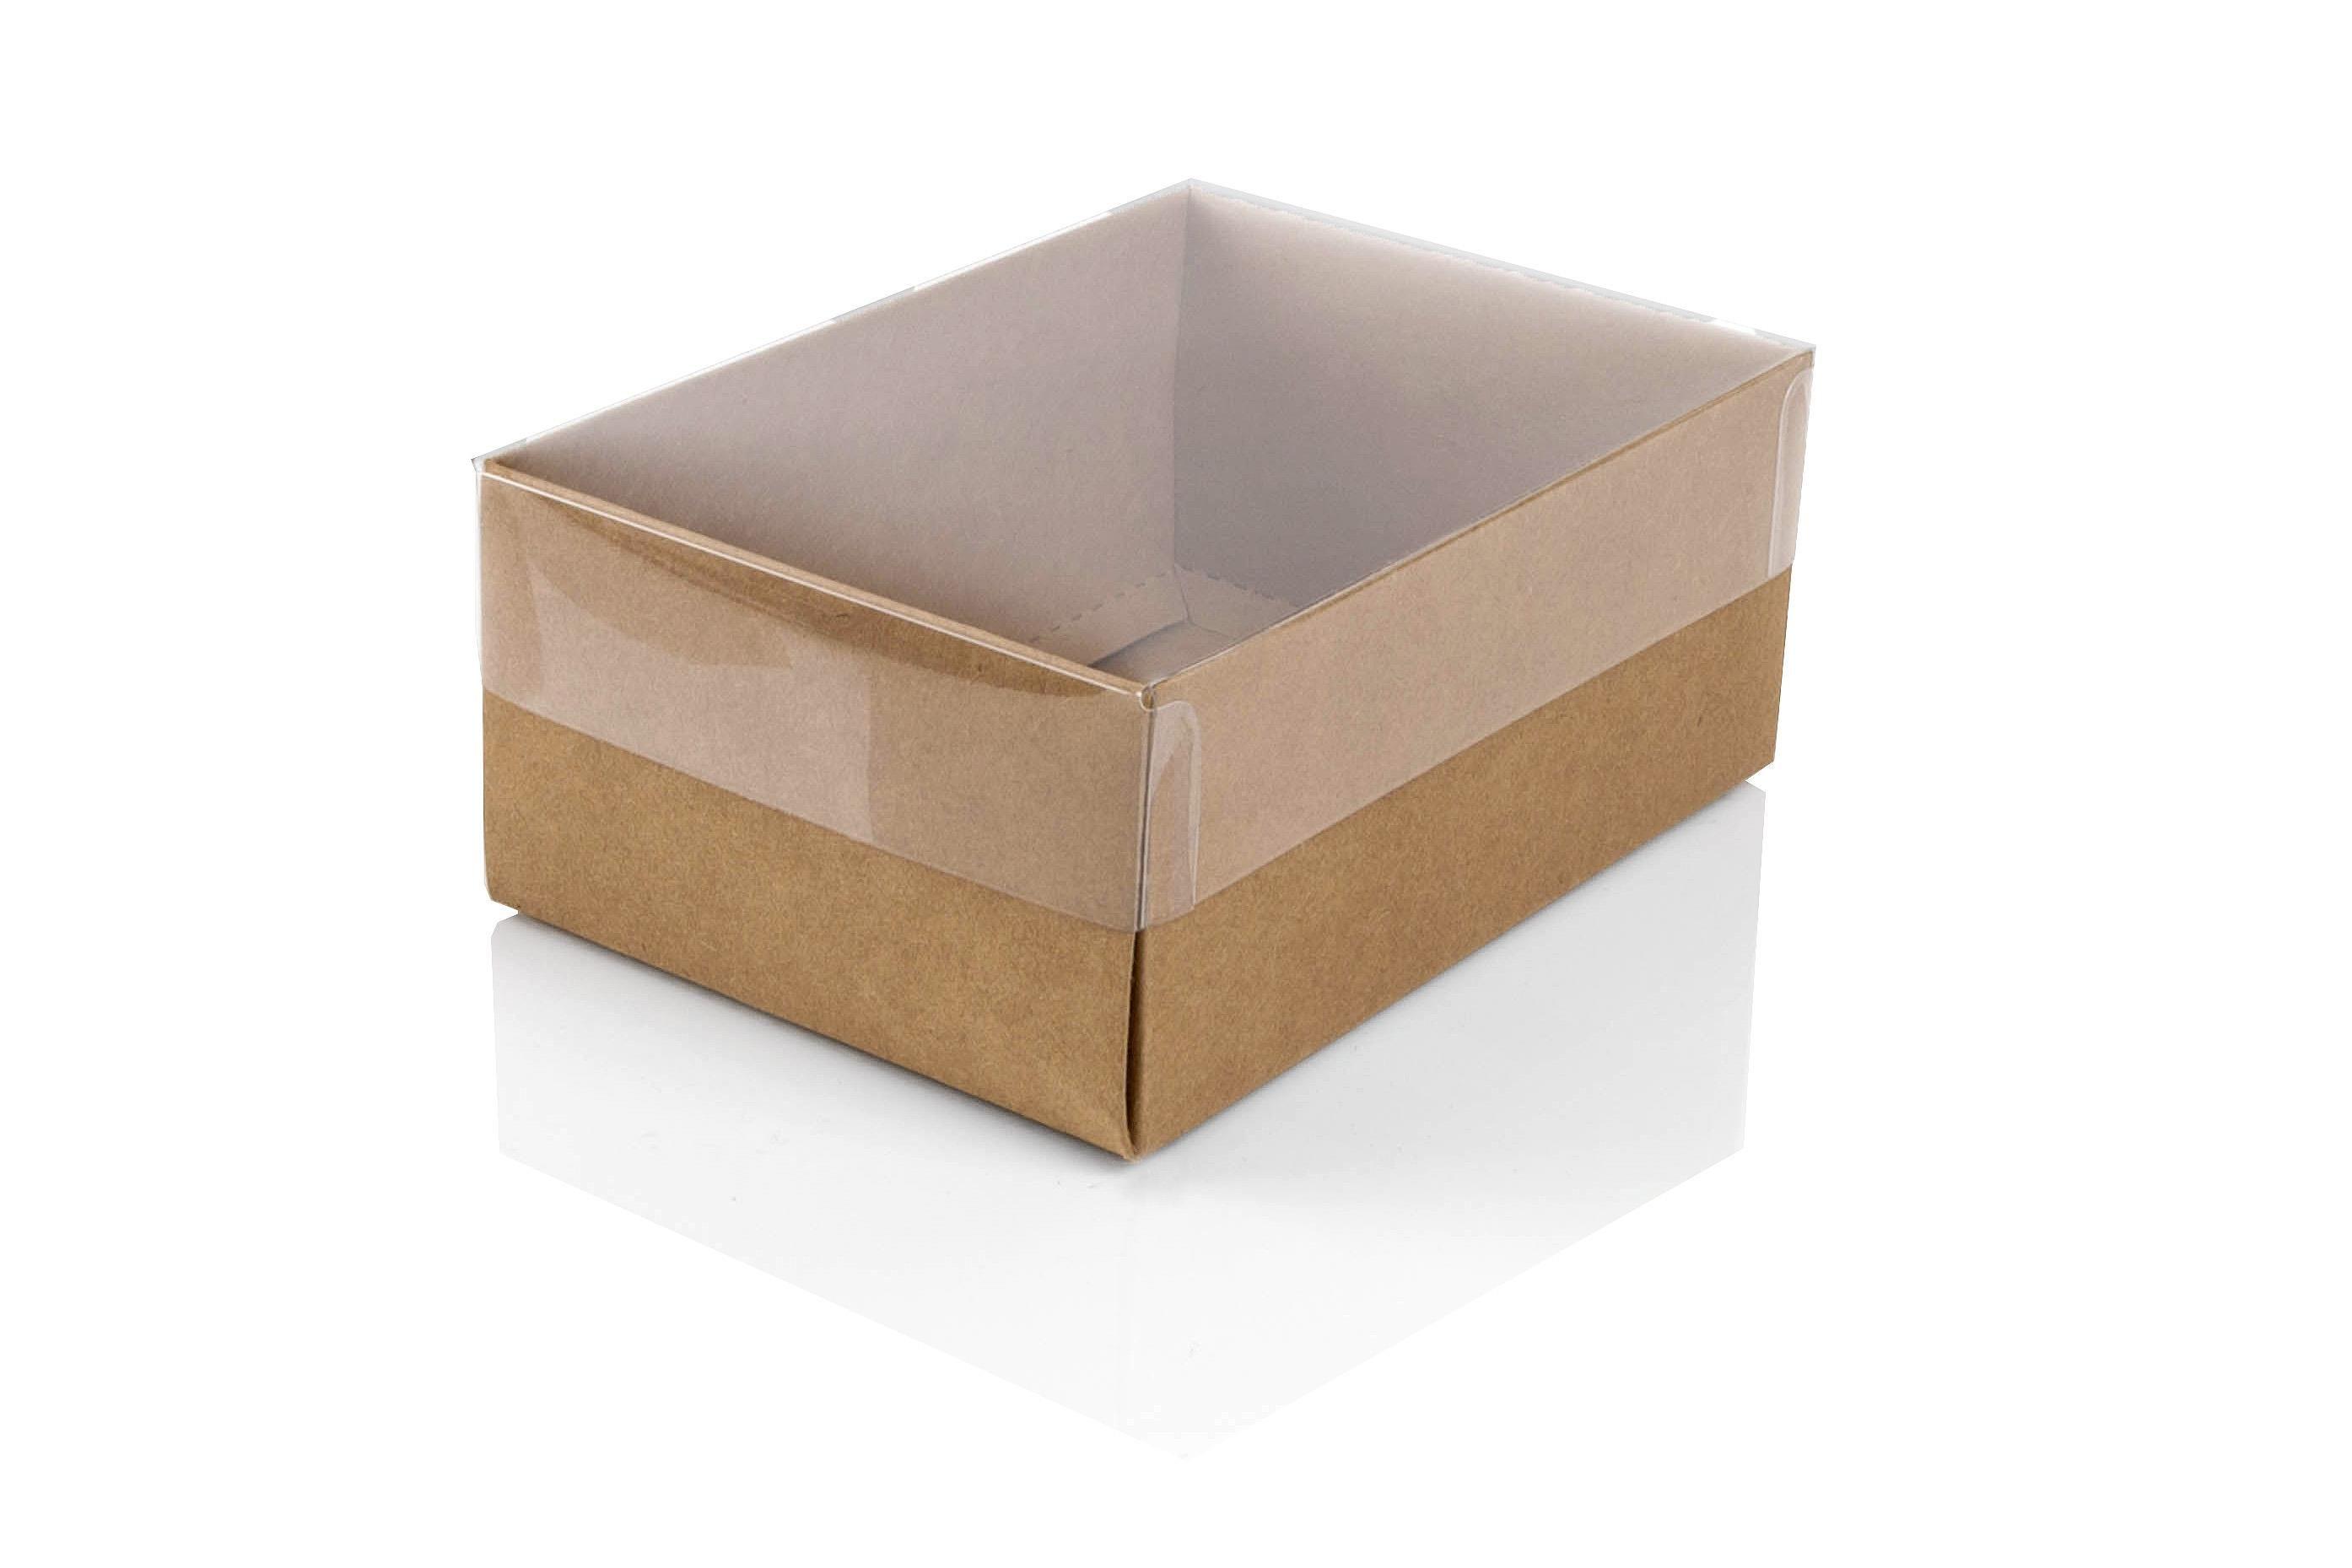 Personalized Photo Keepsake Box - Graduation Memories Box with photo lid